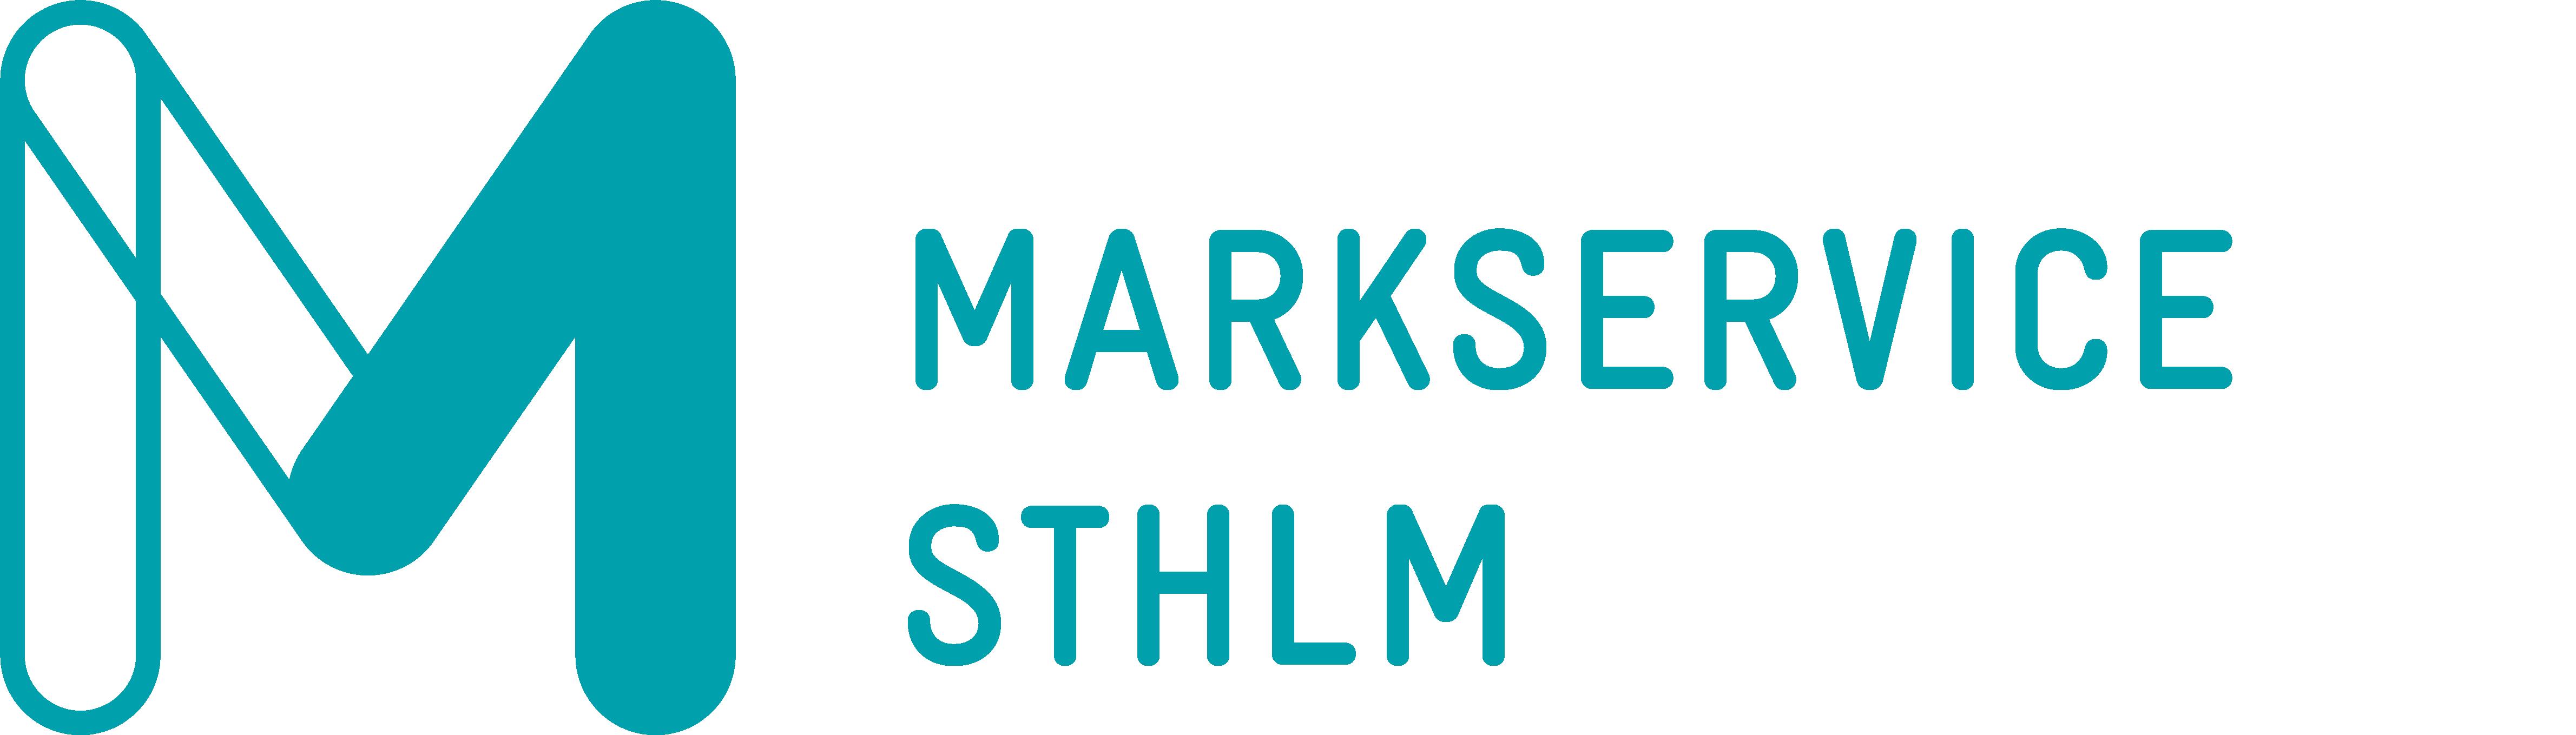 Logotyp Markservice Sthlm